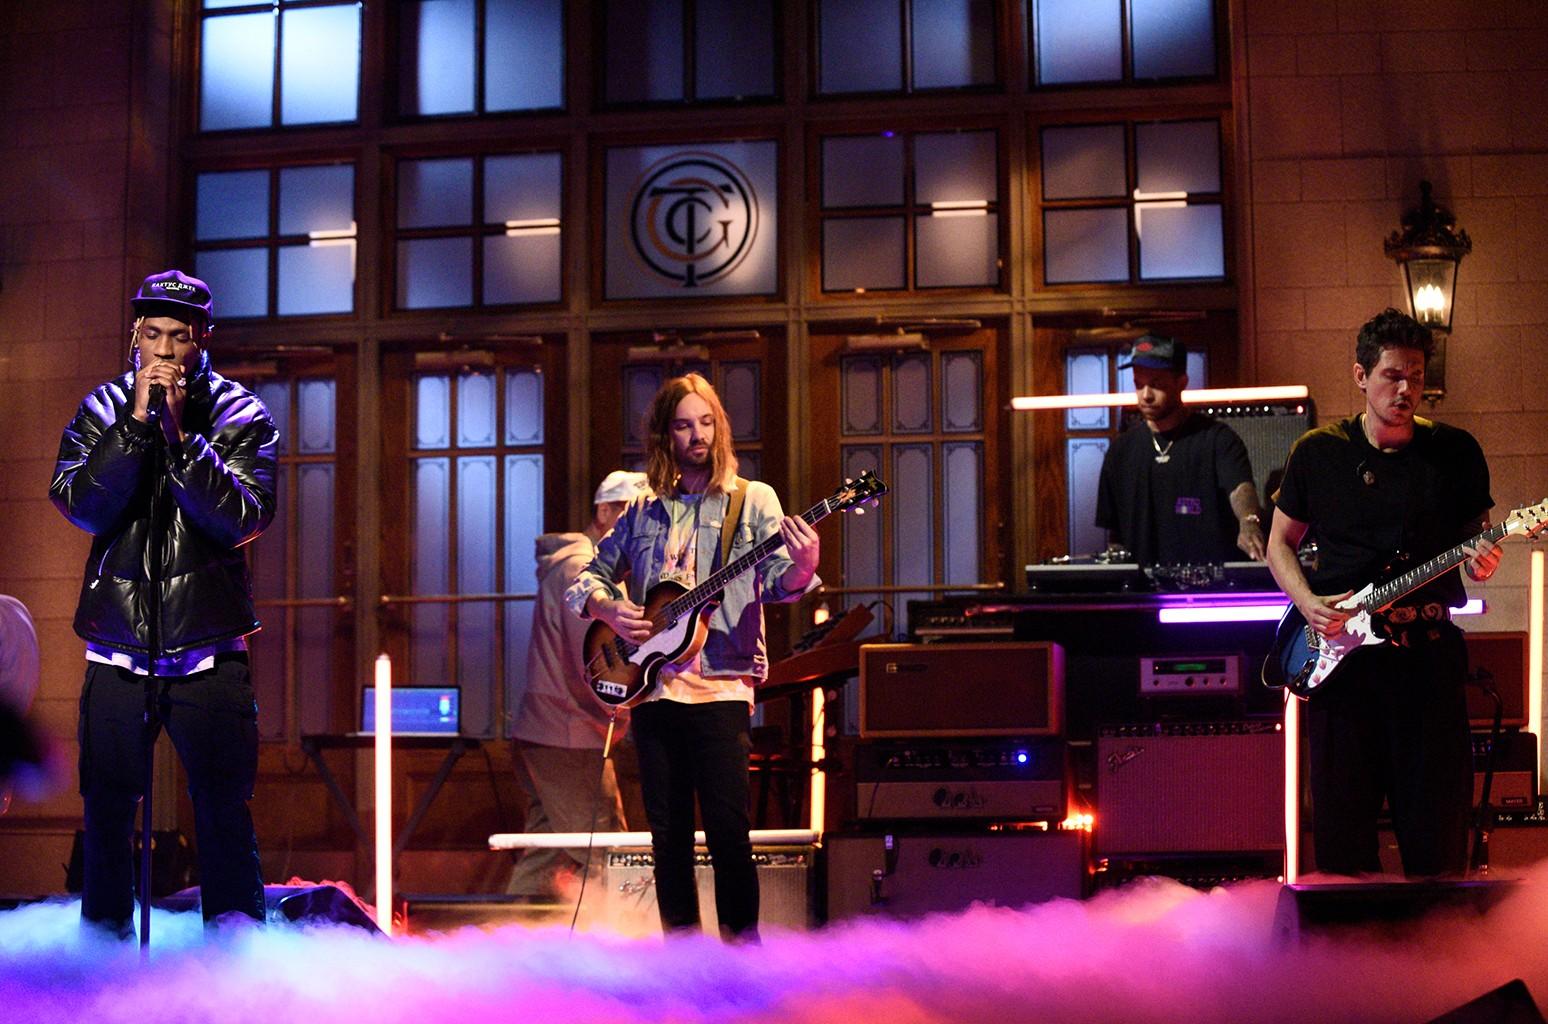 Travis Scott, Kevin Parker and John Mayer